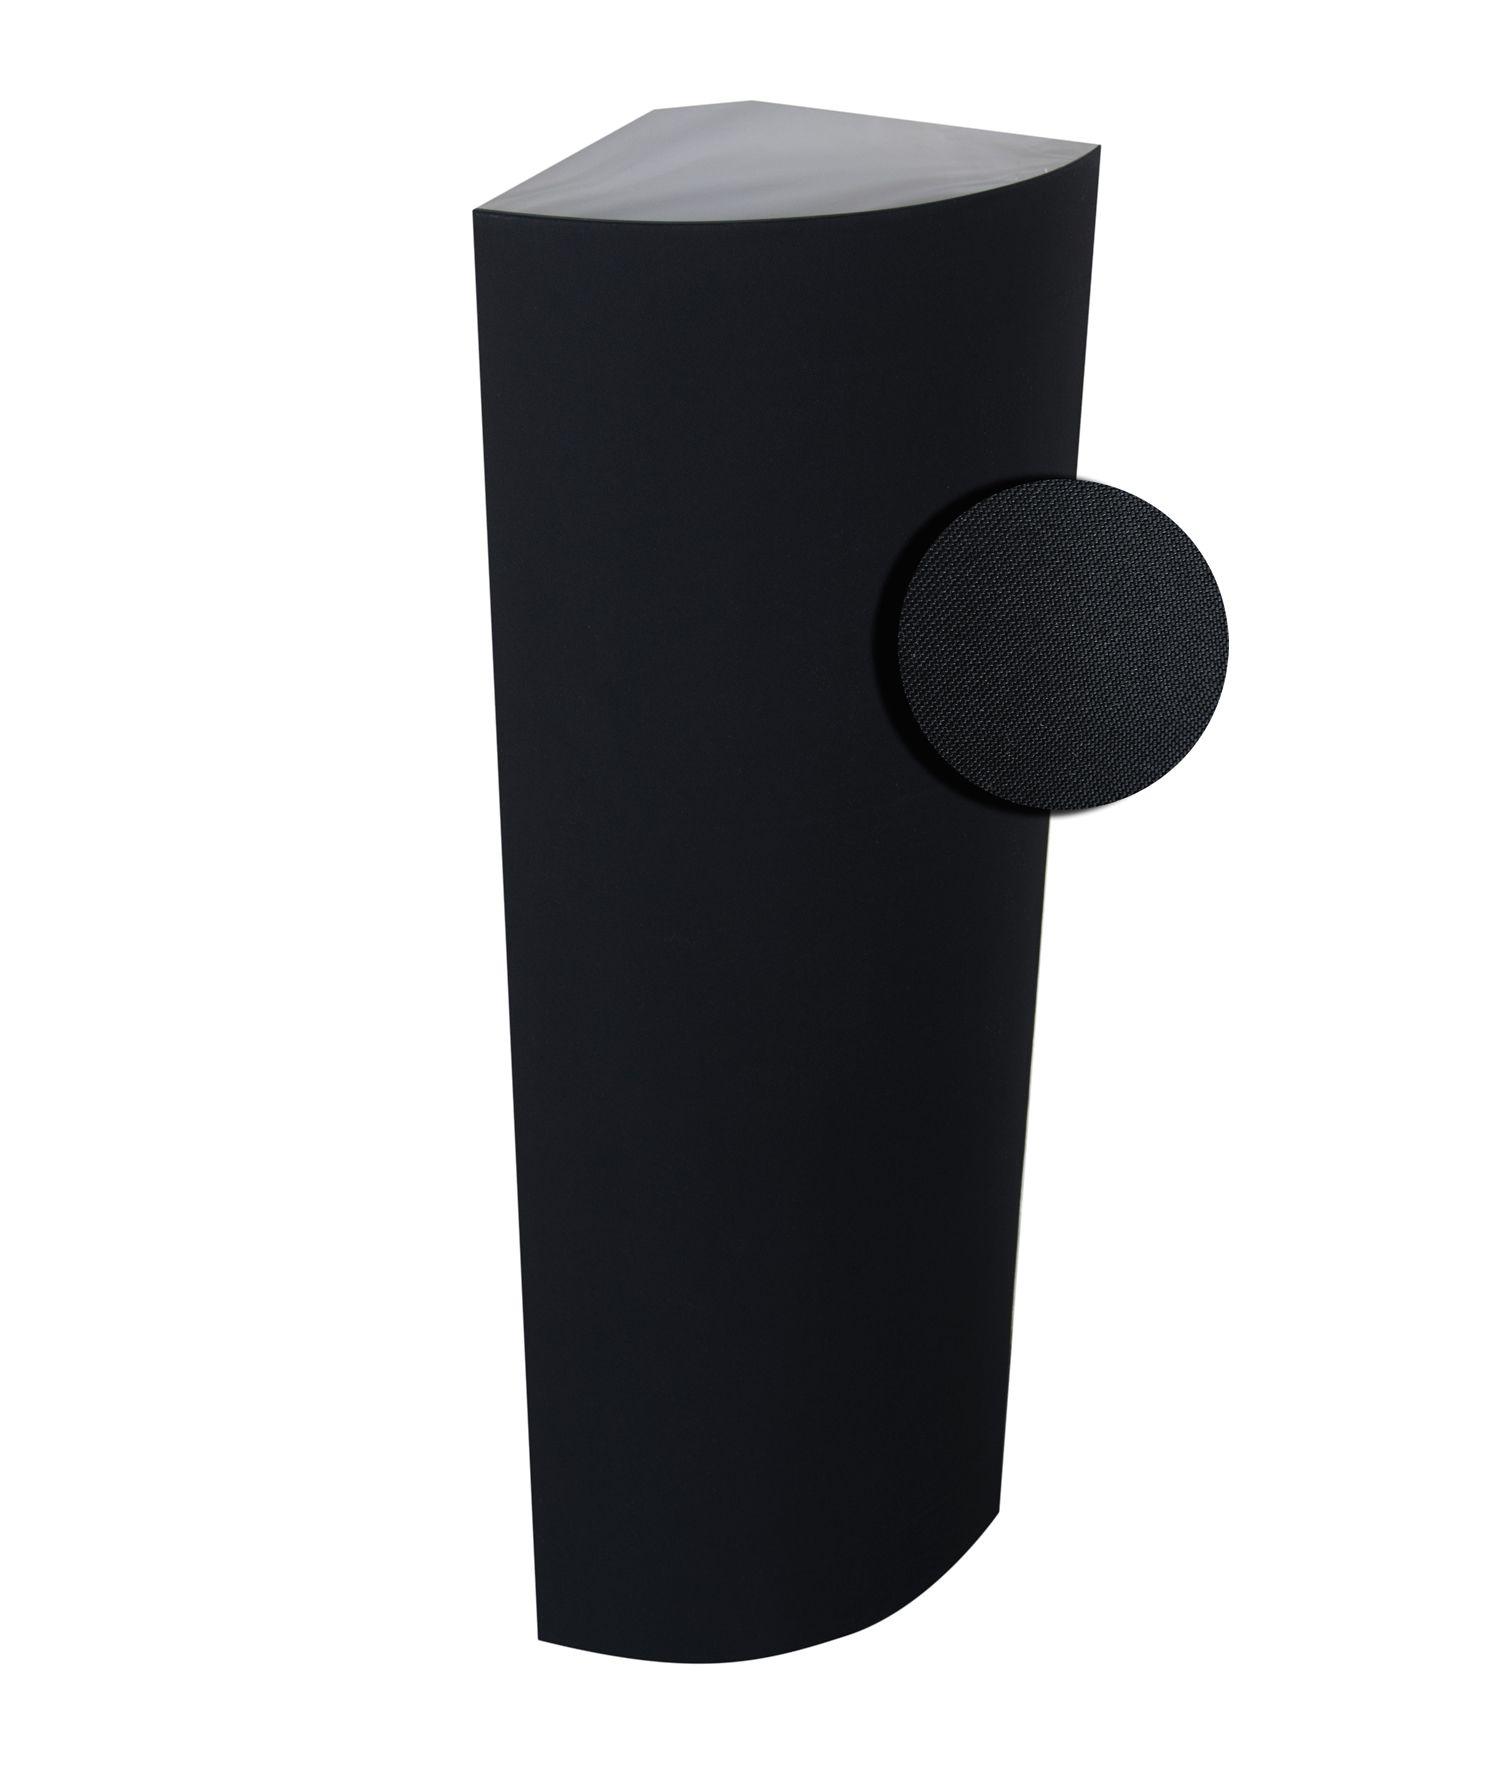 DreamScreen AcoustIQ BassTrap Corner 25x25x120cm with 400Hz Membrane Black 1stk